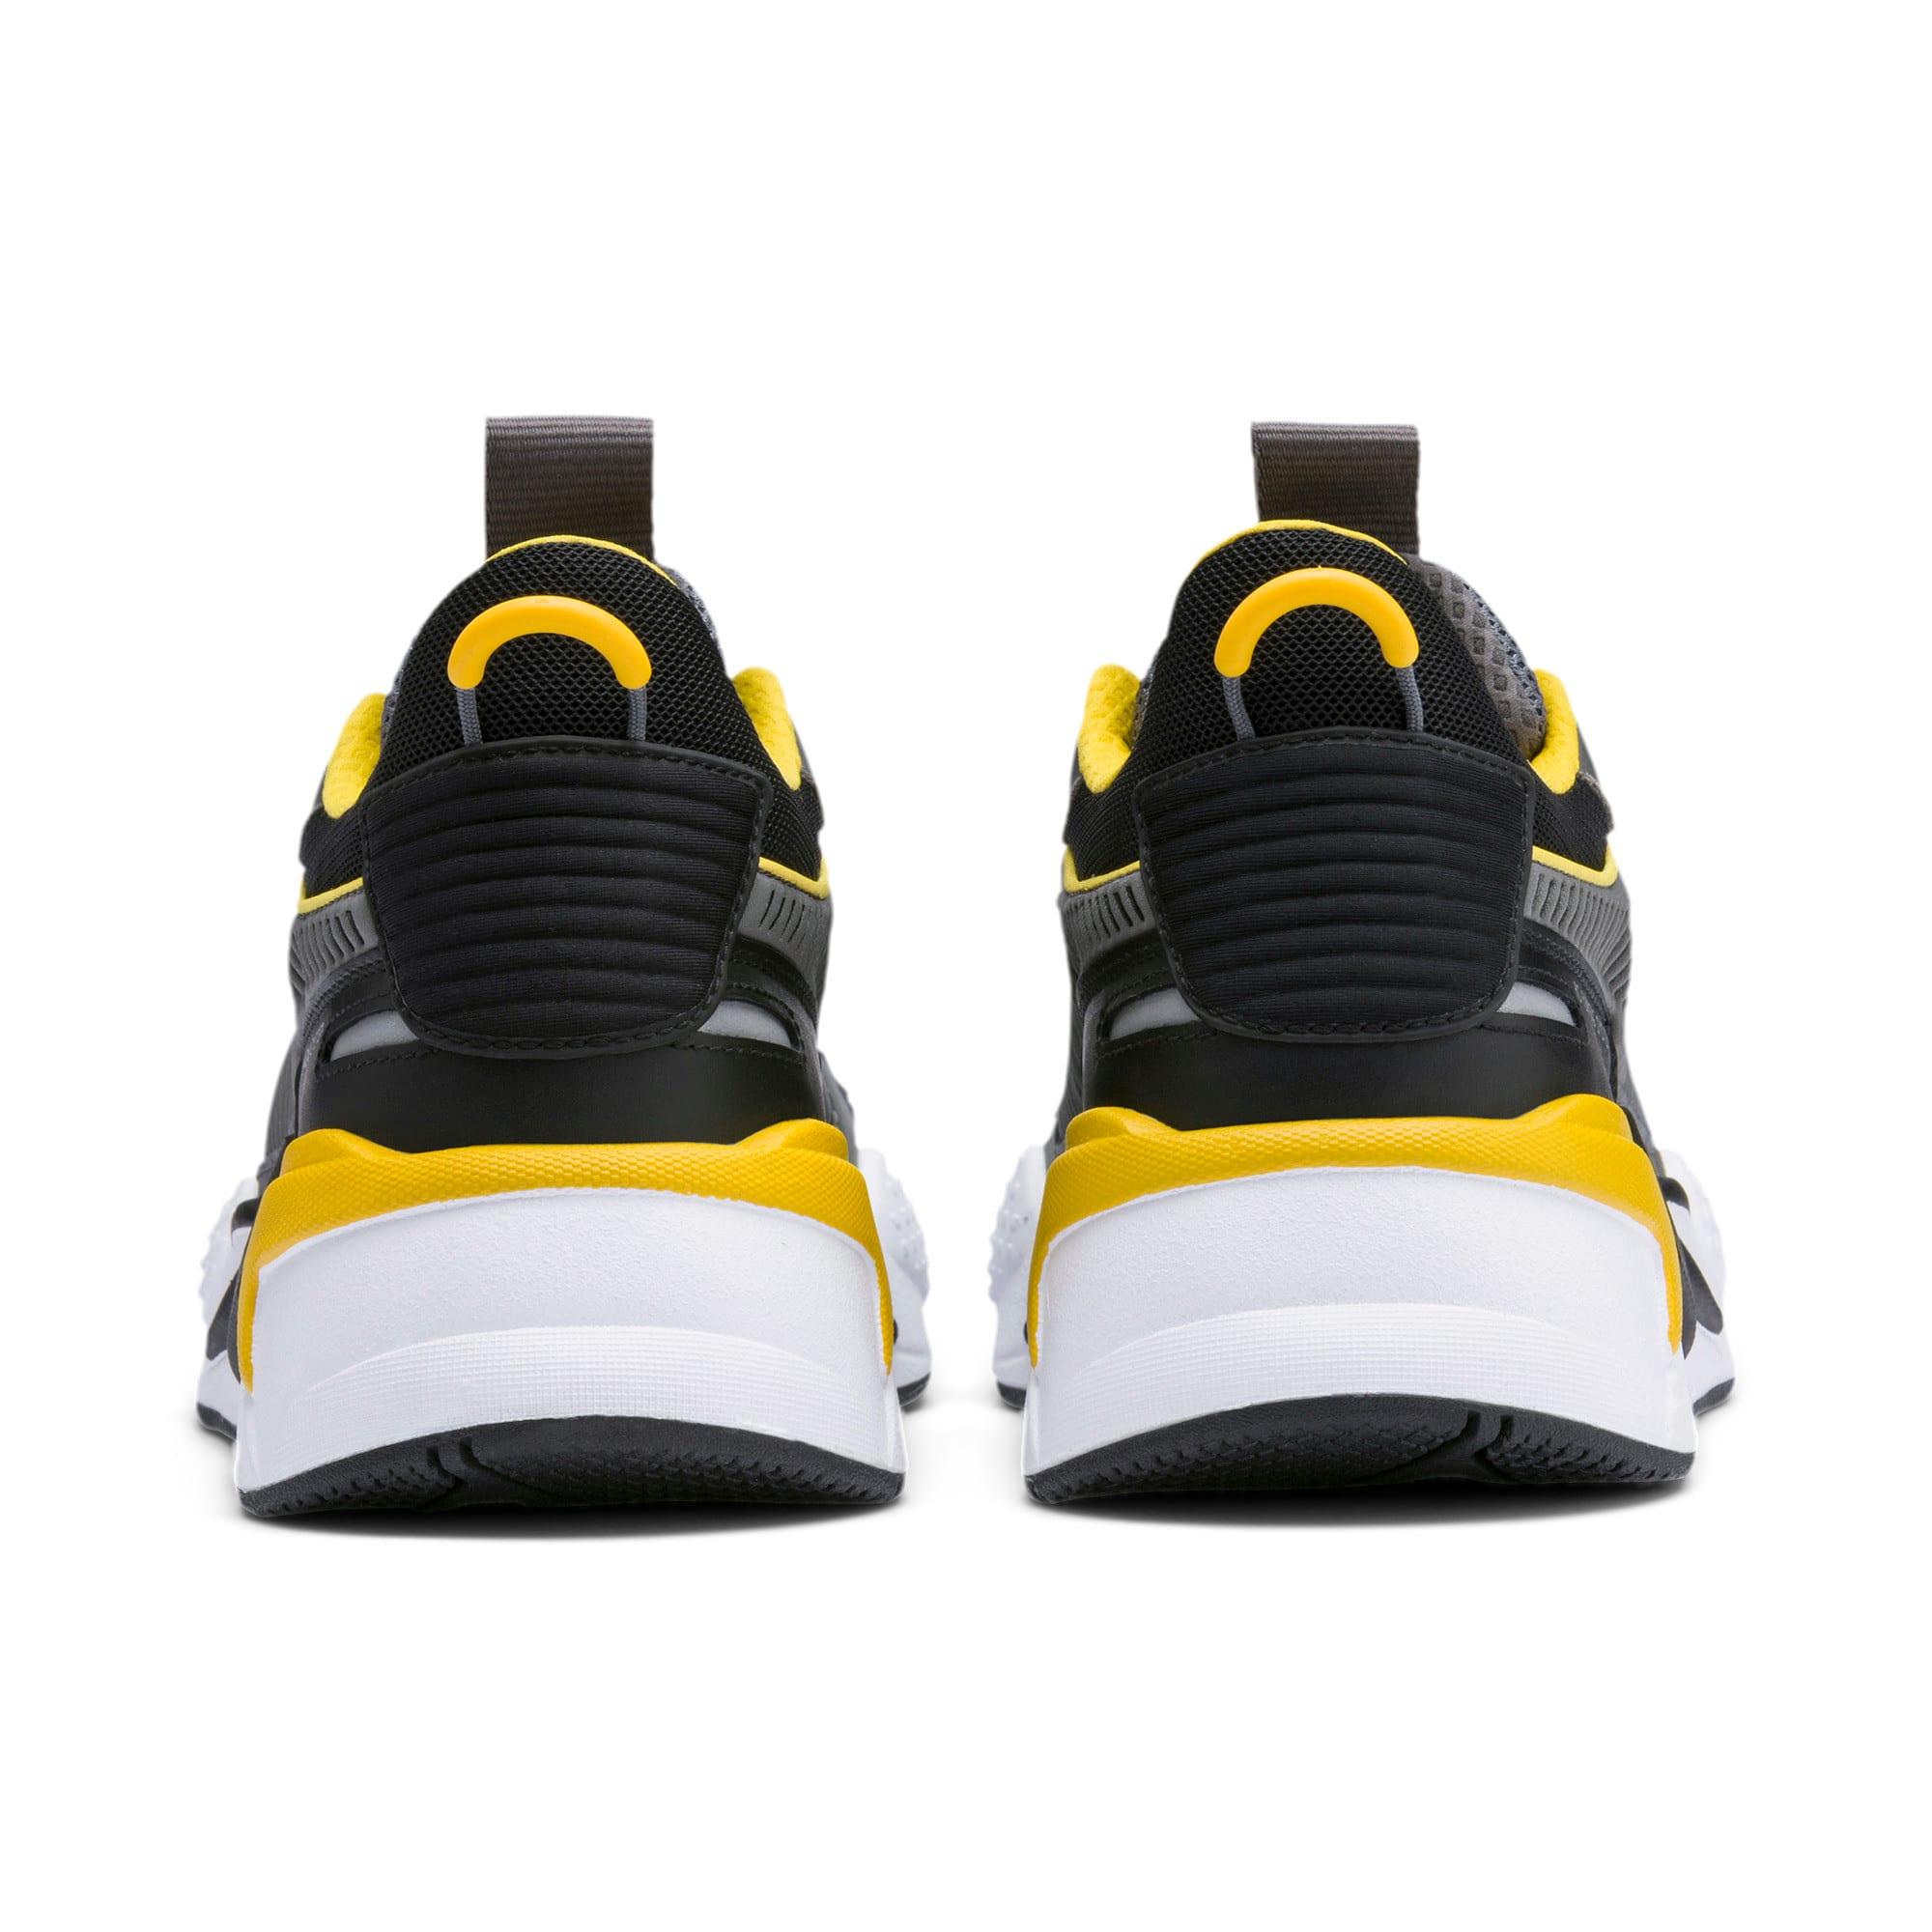 Thumbnail 4 of RS-X Sneaker, CASTLEROCK-Puma Black, medium